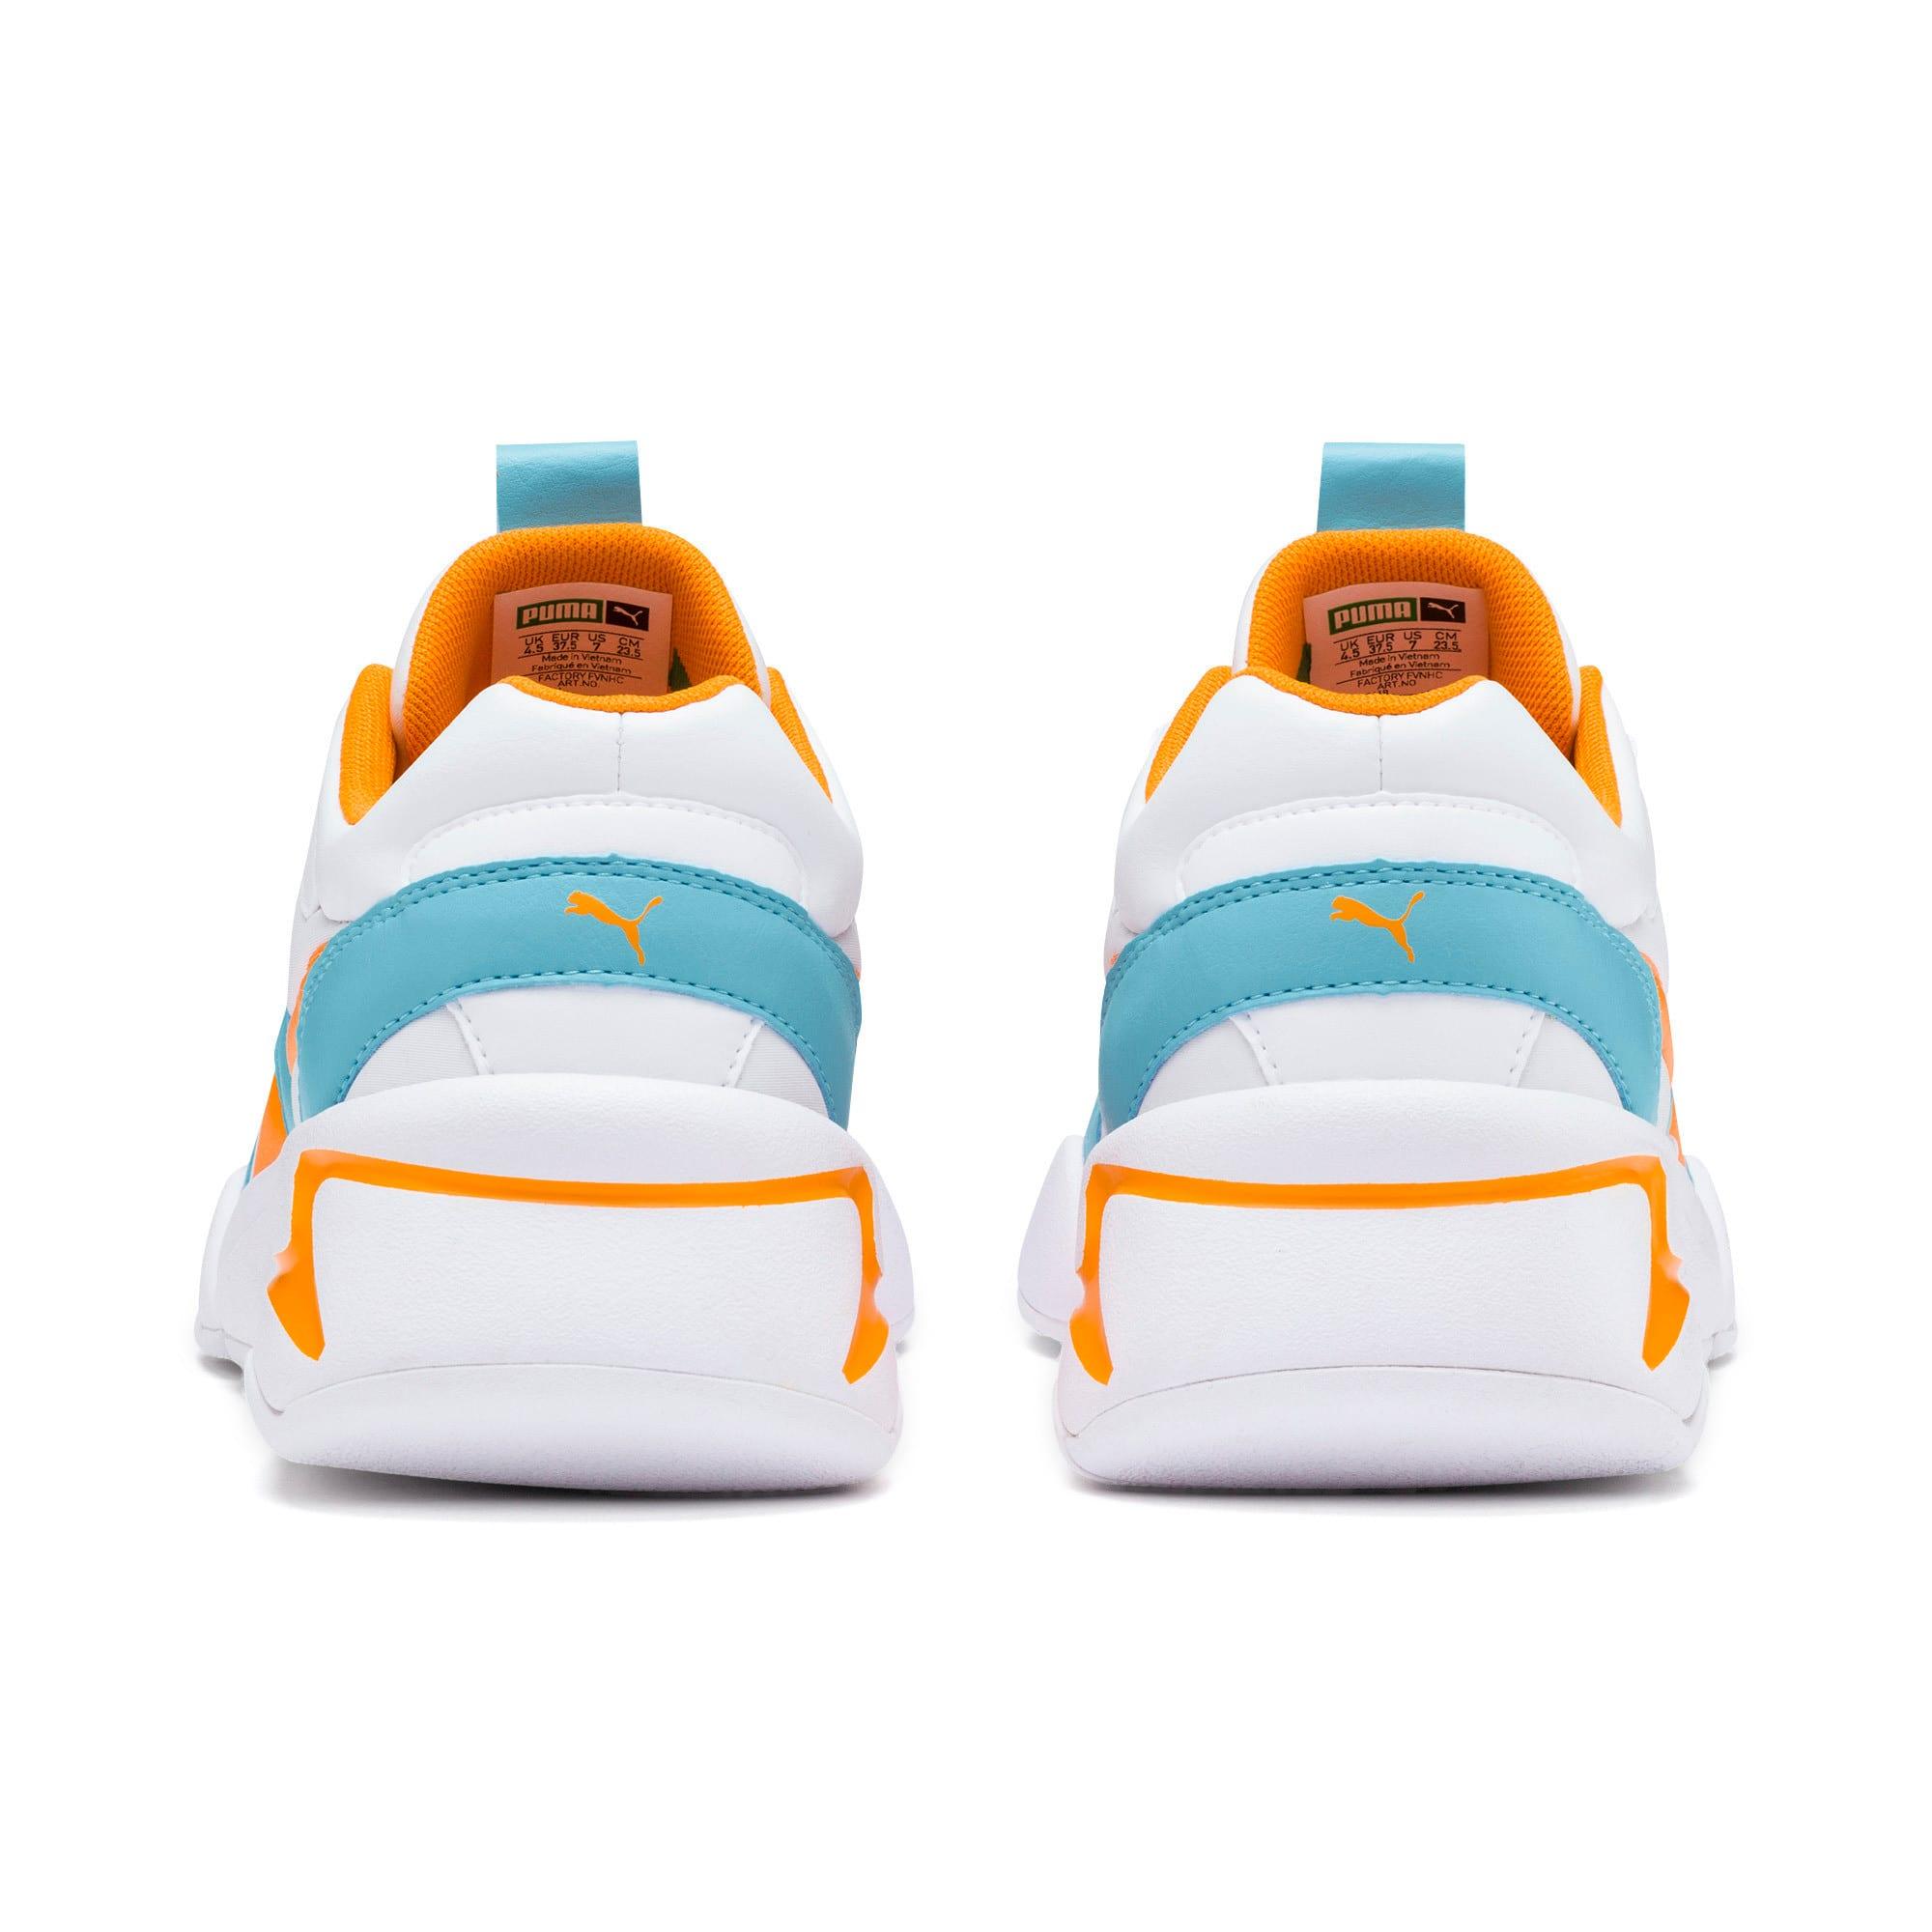 Thumbnail 4 of Nova Women's Sneakers, Puma White-Milky Blue, medium